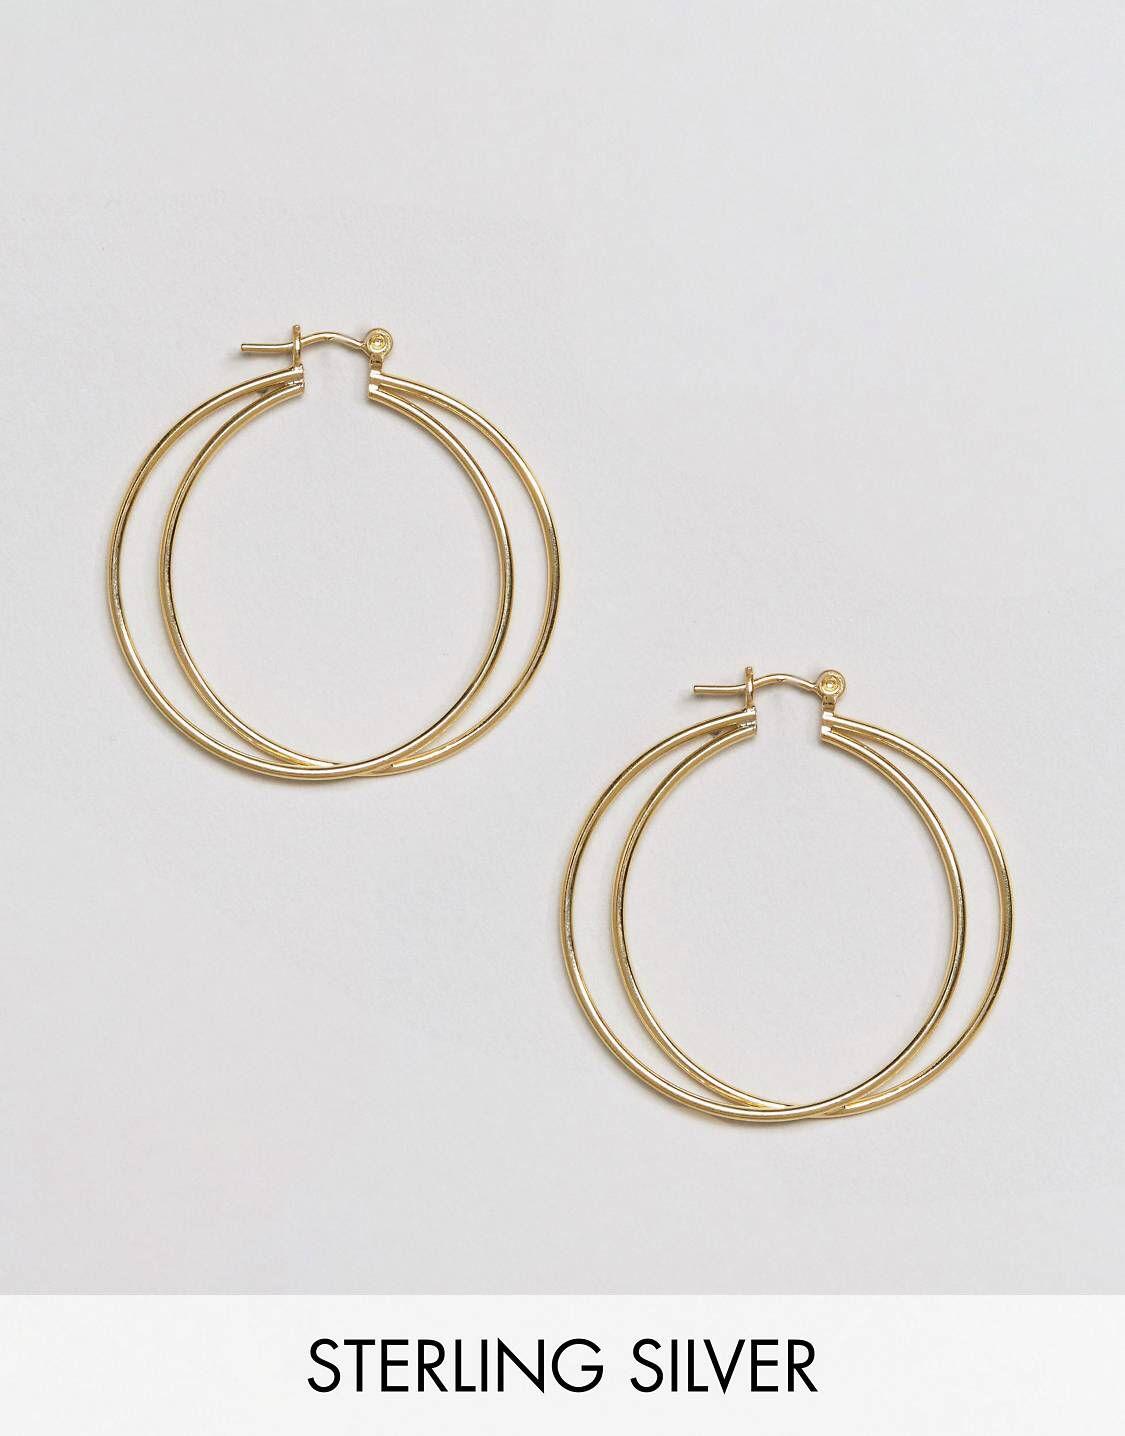 DESIGN Thick Double Row Hoop Earrings - Gold Asos I39zVWg7